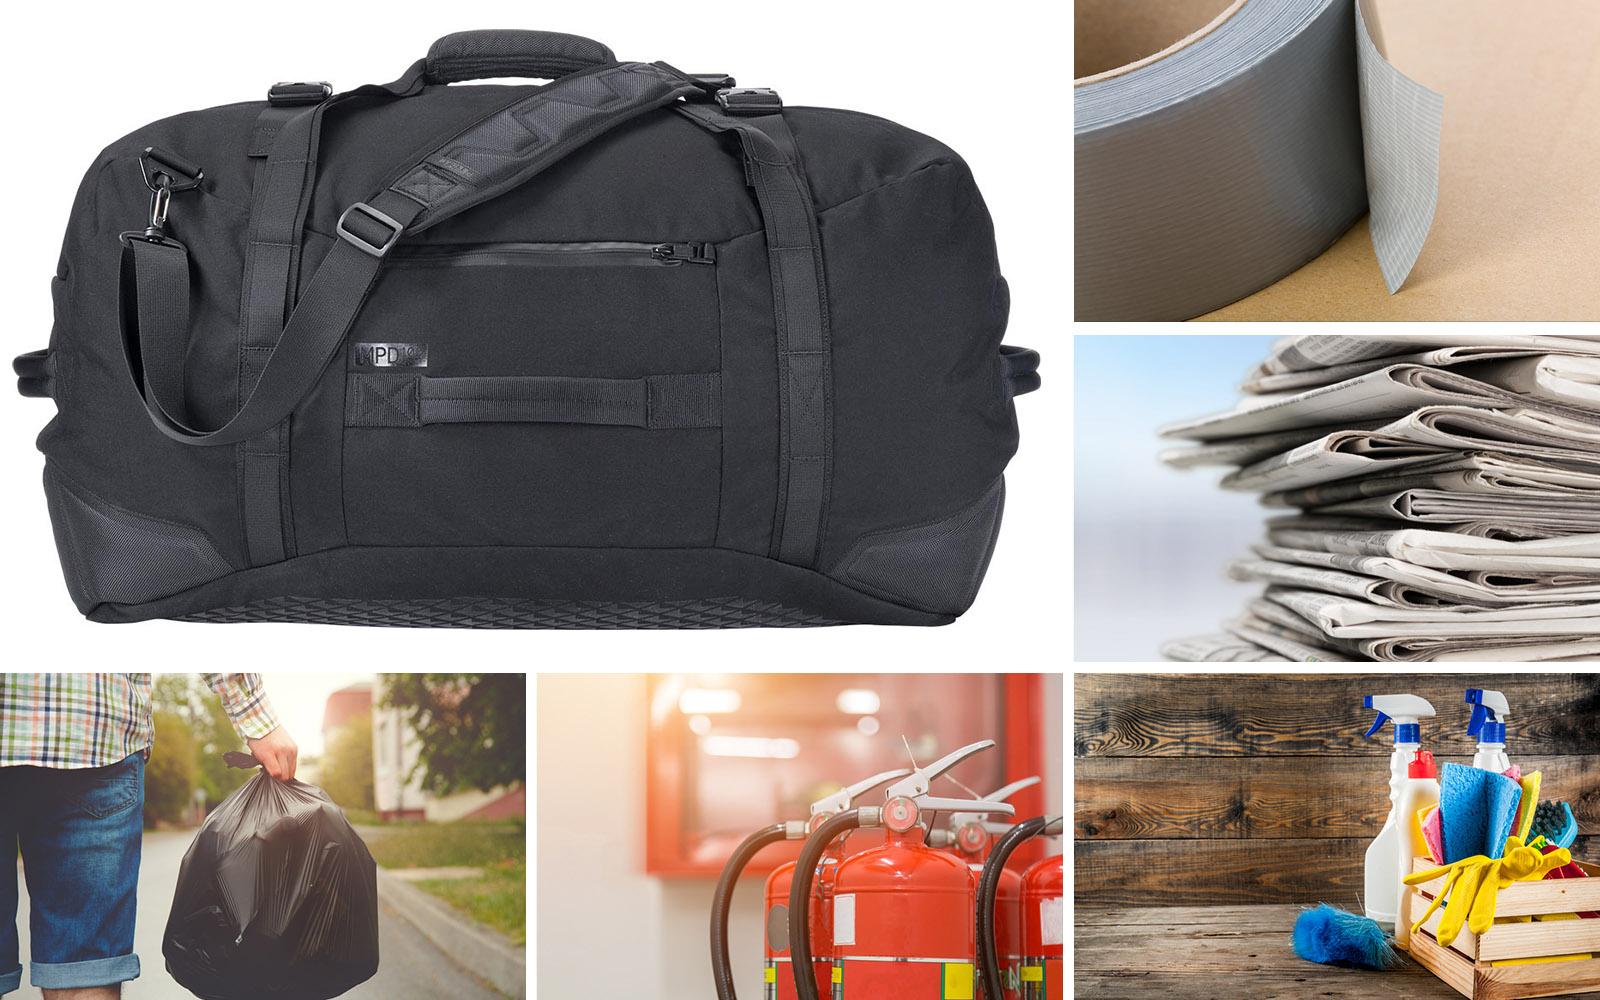 mpd100 soft bag travel duffel bag